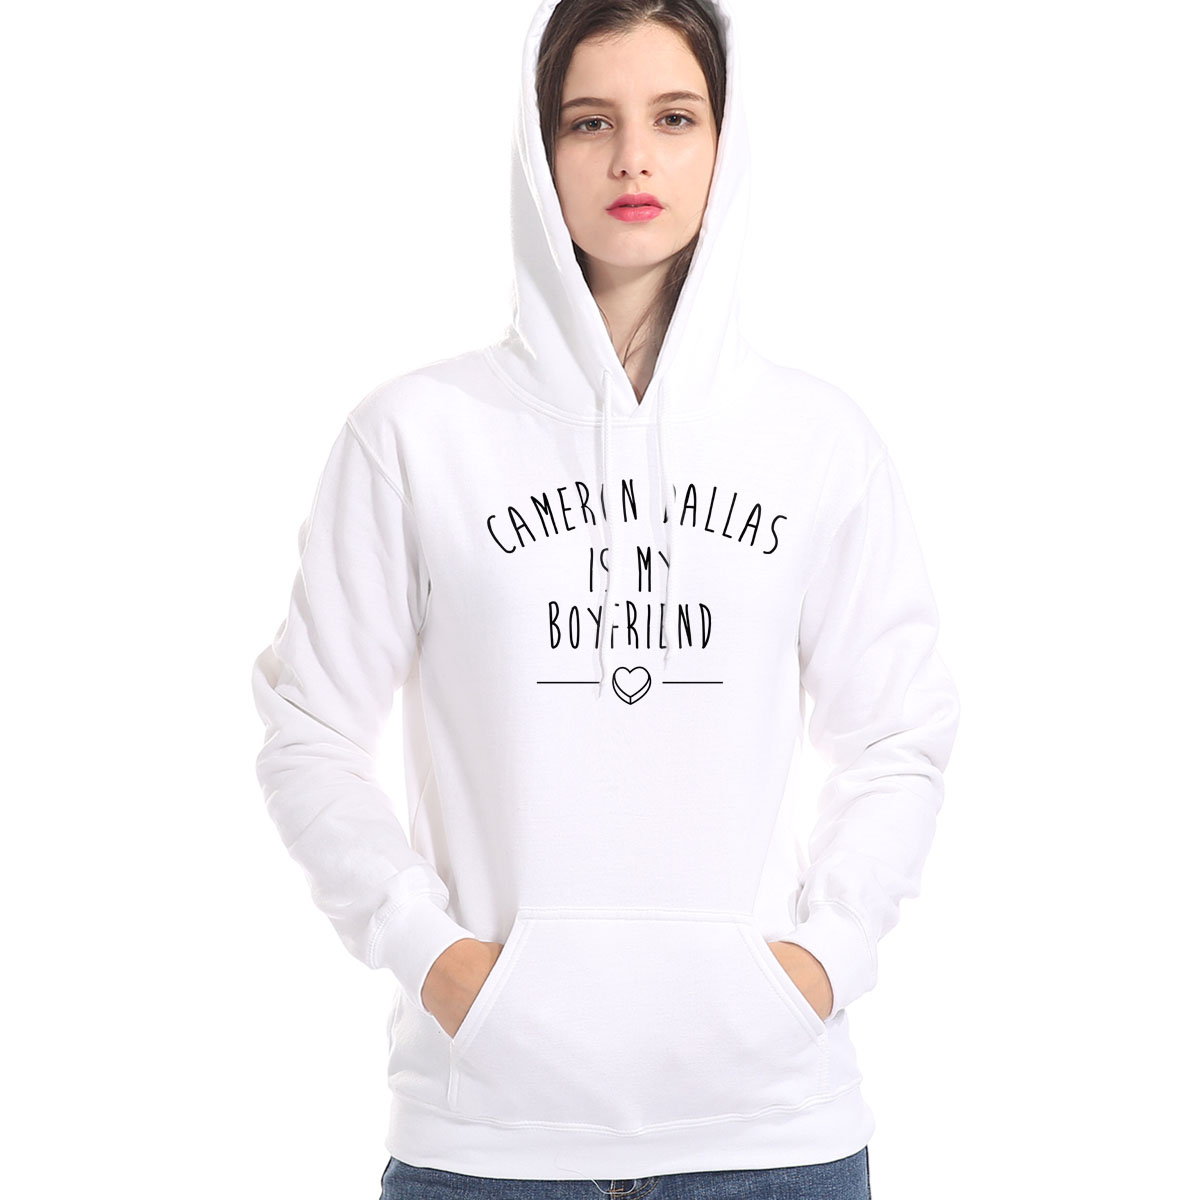 Spring Winter Fashion Women's Hoodies 2019 Casual Pullover Tops CAMERON DALLAS IS MY BOYFRIEND Sweatshirts Harajuku Sportswear